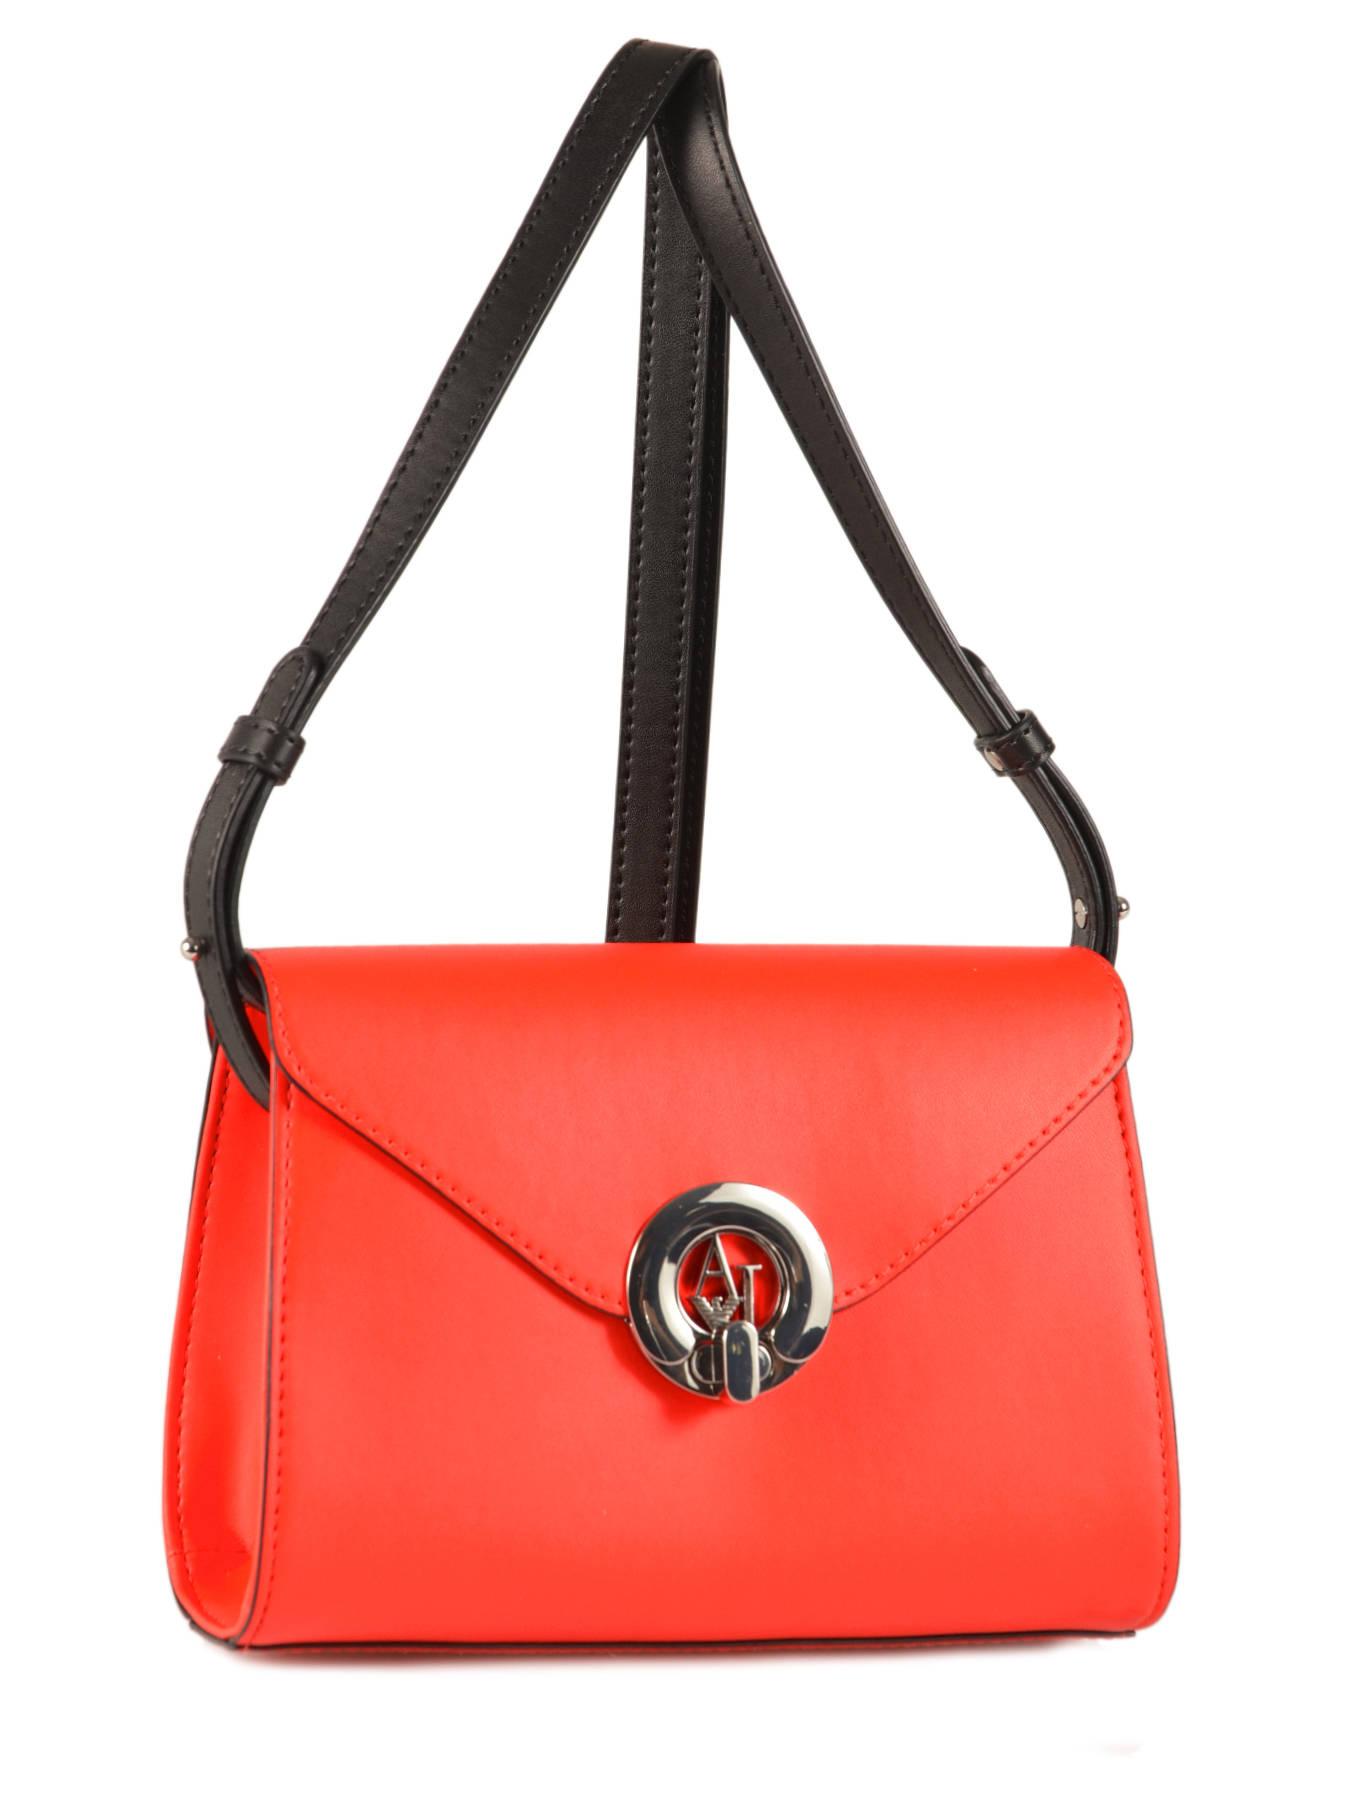 Sac A Bandouliere Armani Femme : Eco color block armani jeans bag best prices